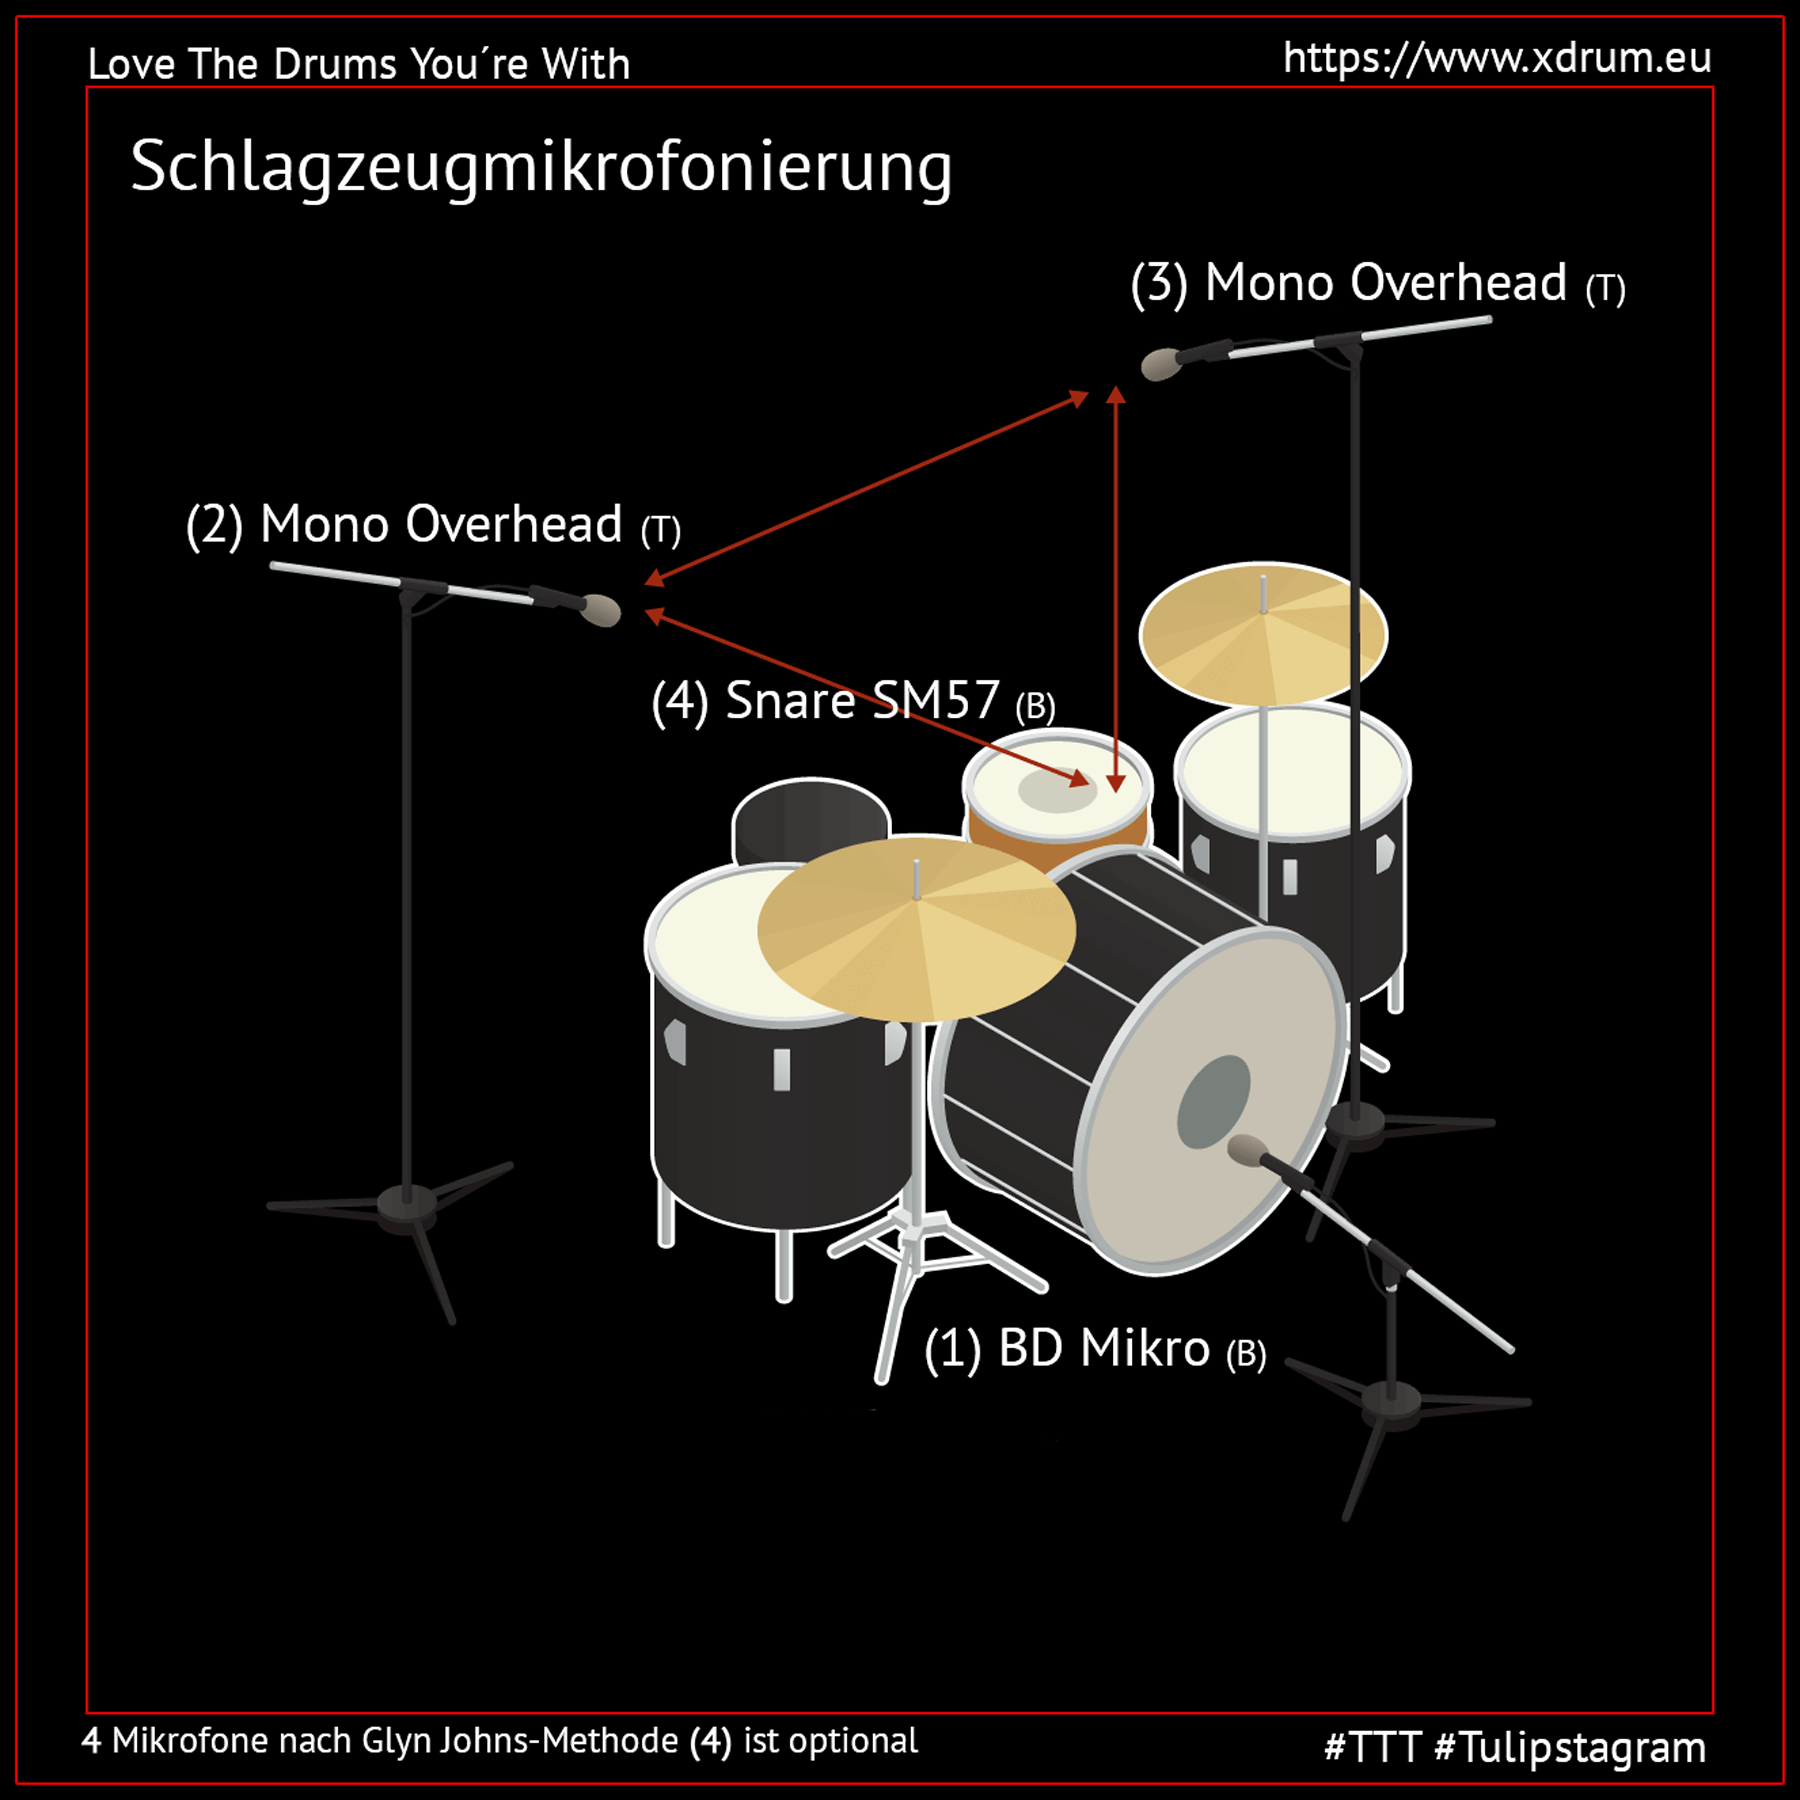 Schlagzeugmikrofonierung nach der Glyn Johns-Methode (Symbolbild) #GlynJohnsMethod #TTT #Tulipstagram